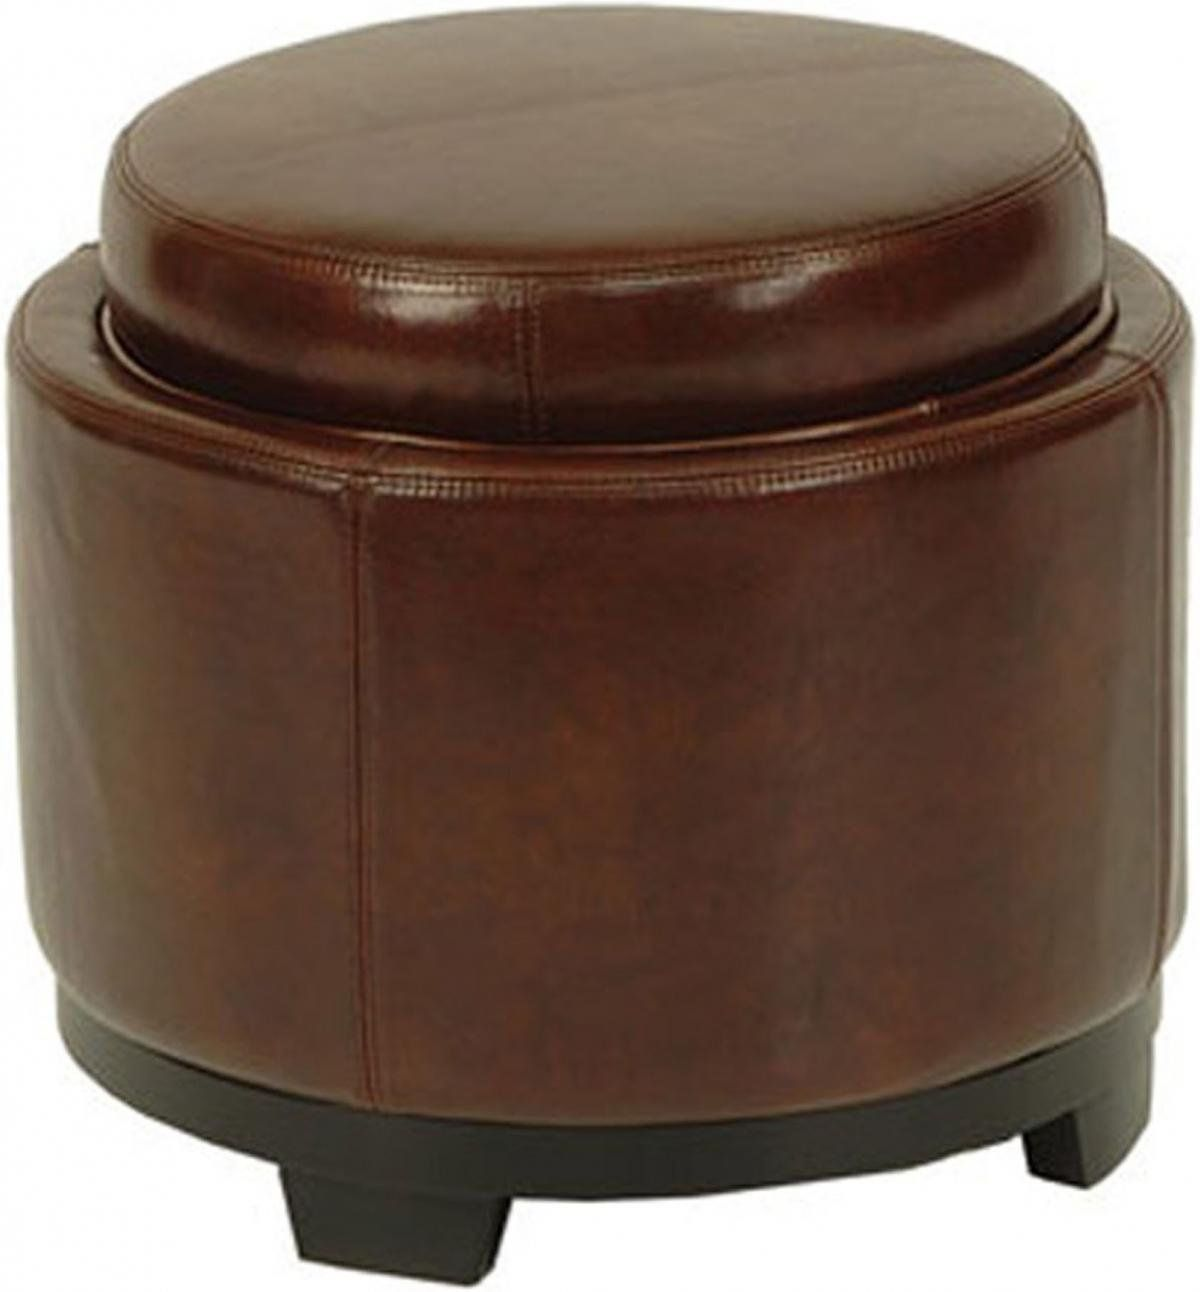 safavieh hudson collection chloe leather single tray round storage ottoman cordovan